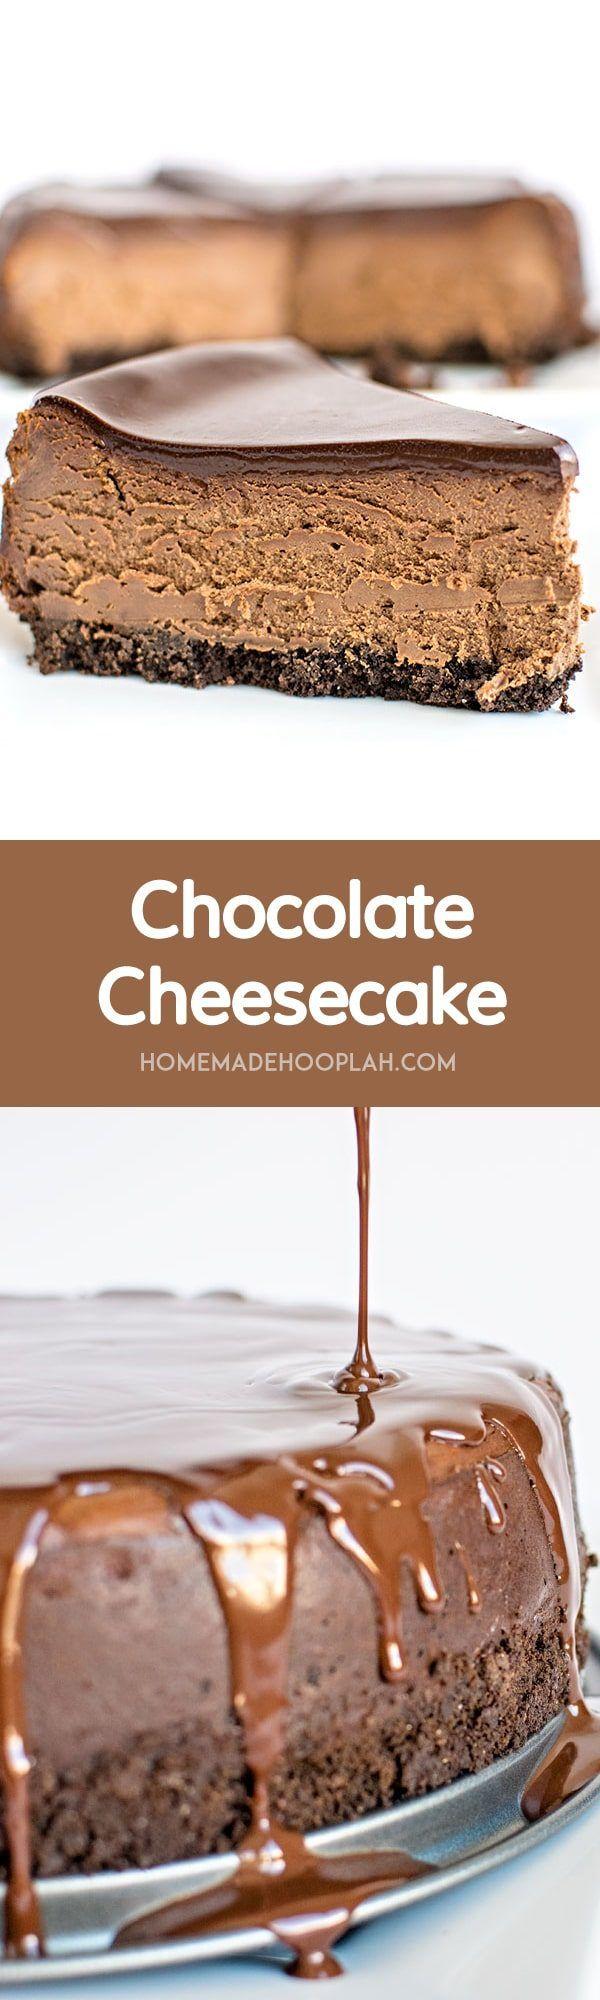 Chocolate Cheesecake Make Oreo crust instead.